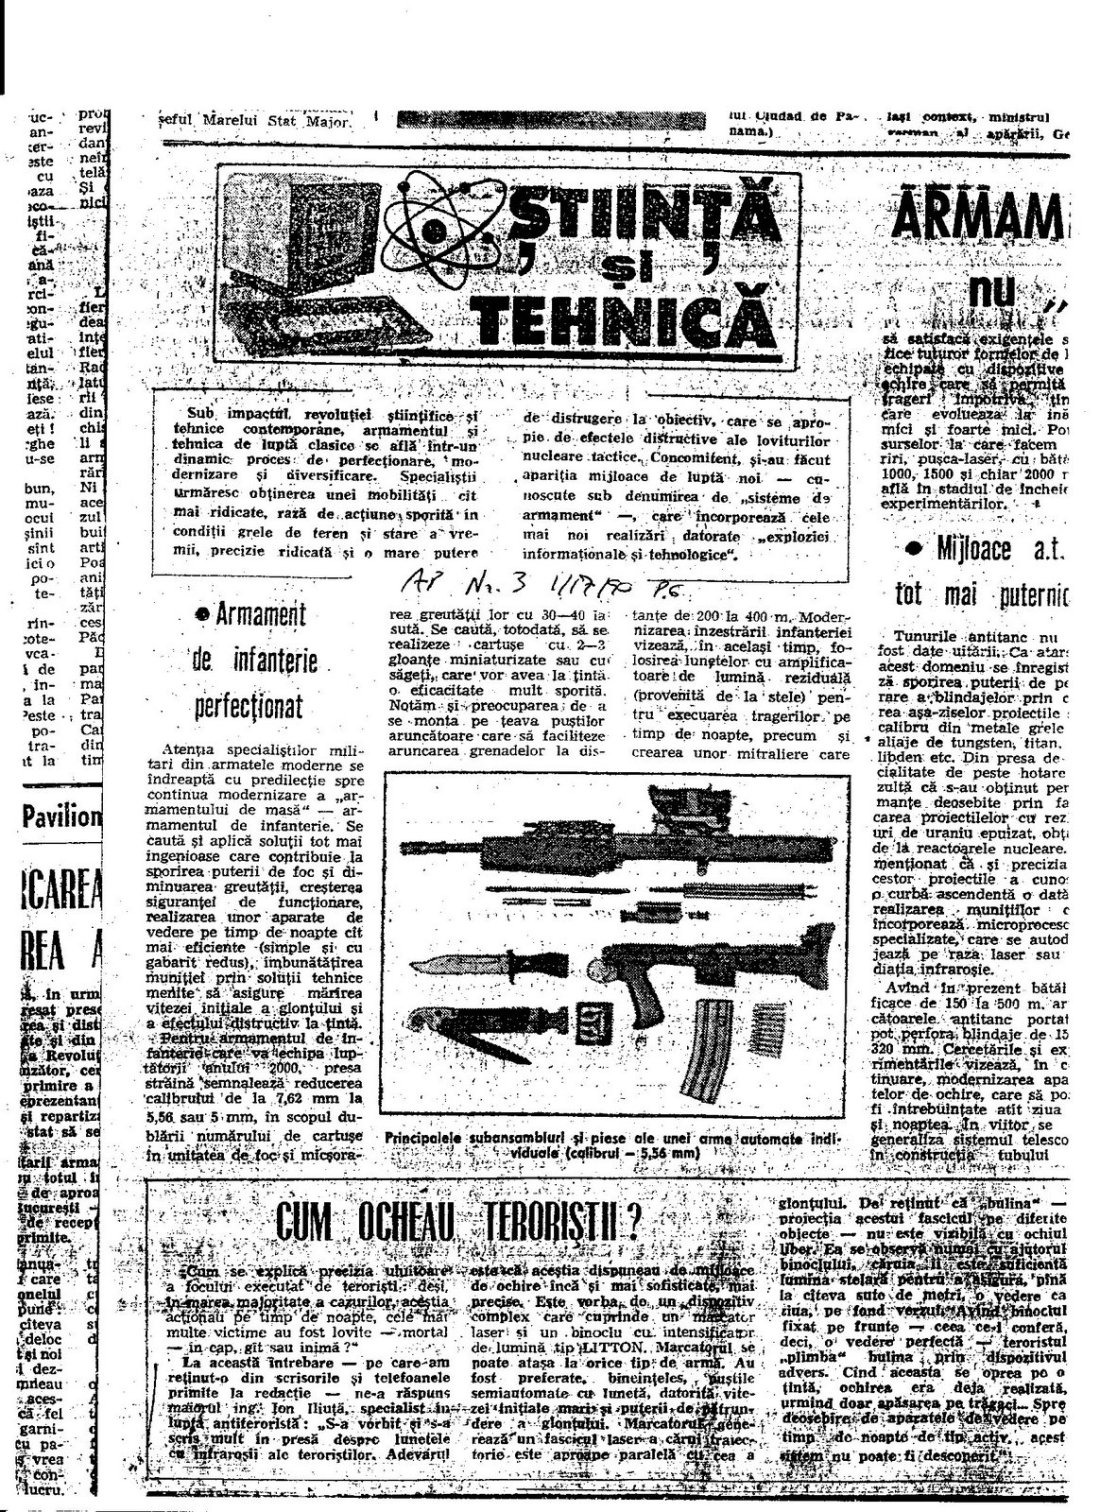 https://romanianrevolutionofdecember1989.files.wordpress.com/2009/12/image-62.jpg